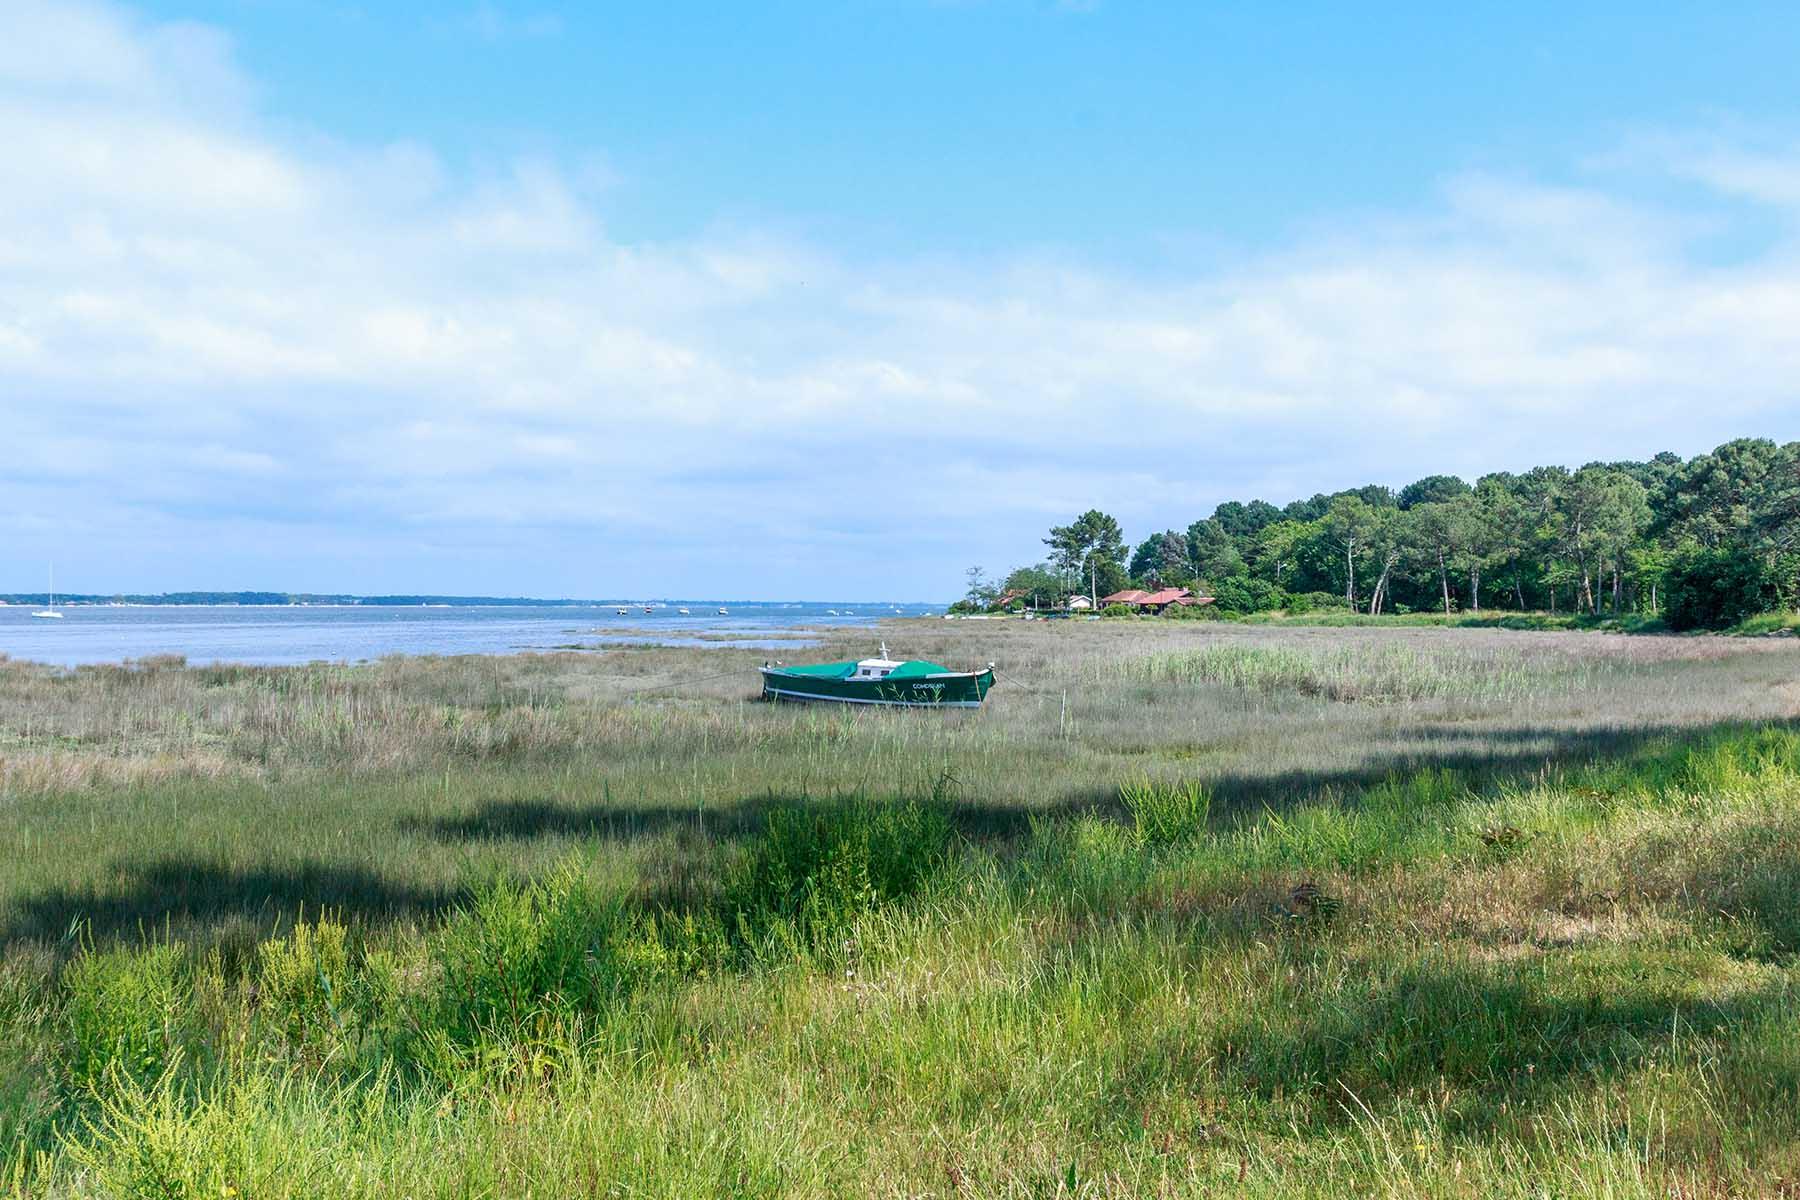 Balade en bord du Bassin d'Arcachon à Claouey